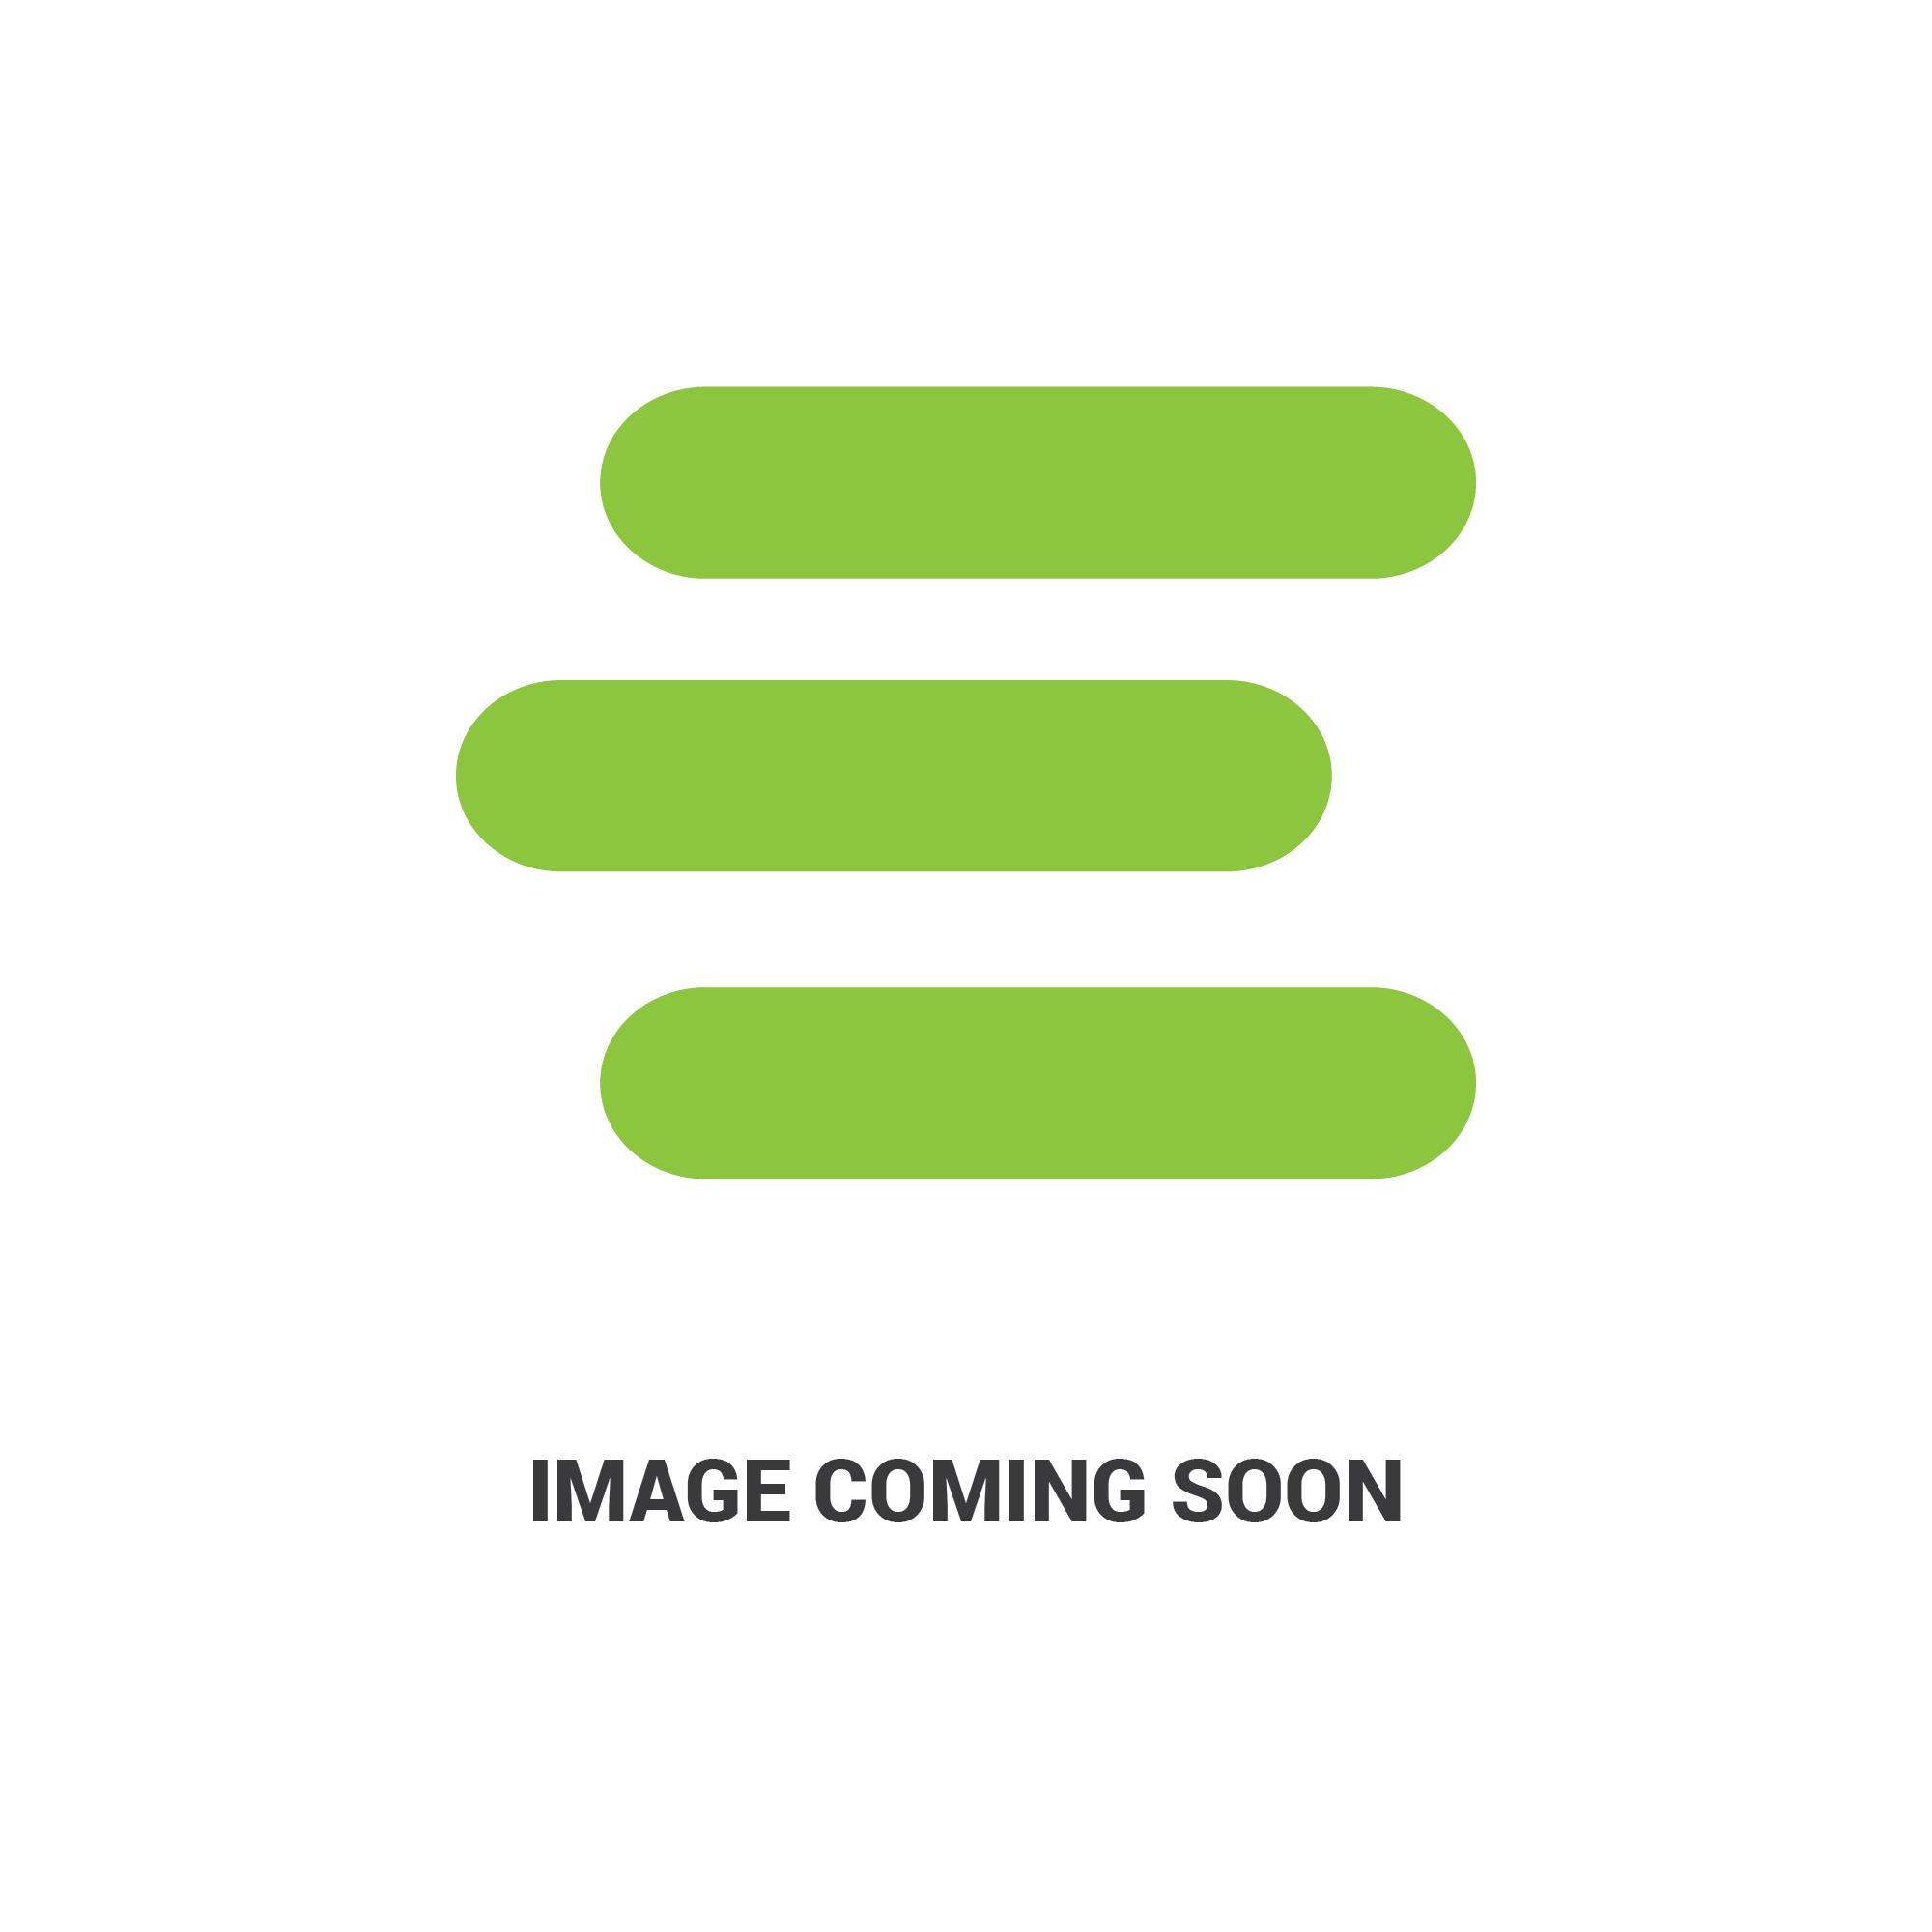 E-LP01edit 10.jpg